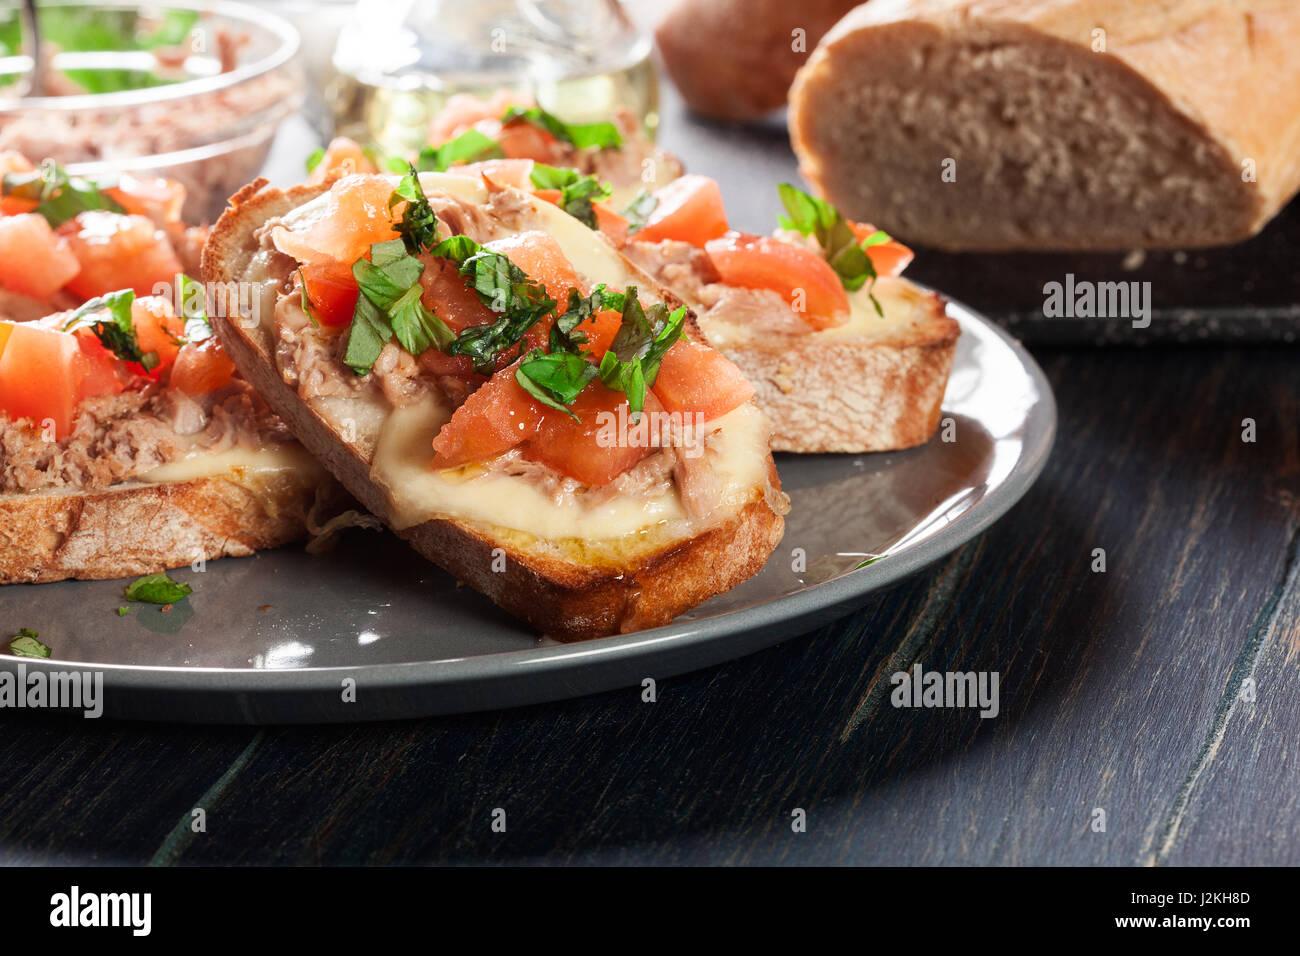 Appetizer bruschetta with tuna, mozarella cheese and tomatoes. Italian cuisine - Stock Image